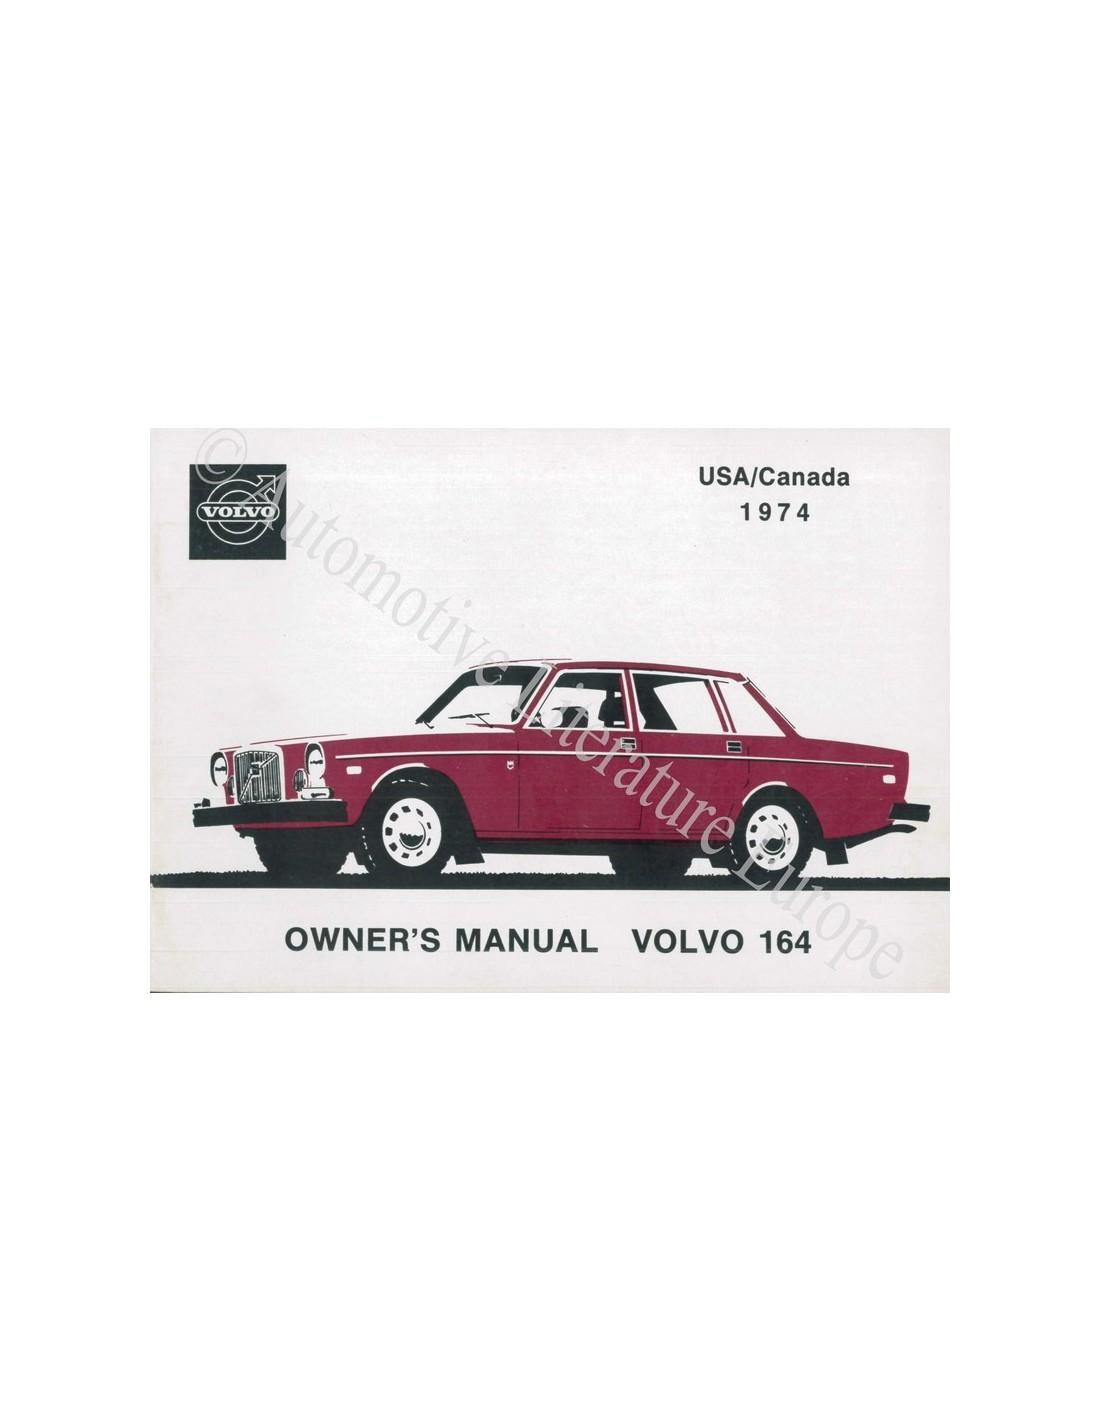 1974 volvo 164 owner s manual english usa canada rh autolit eu Volvo Factory Service Manuals 04 Volvo S40 Manual